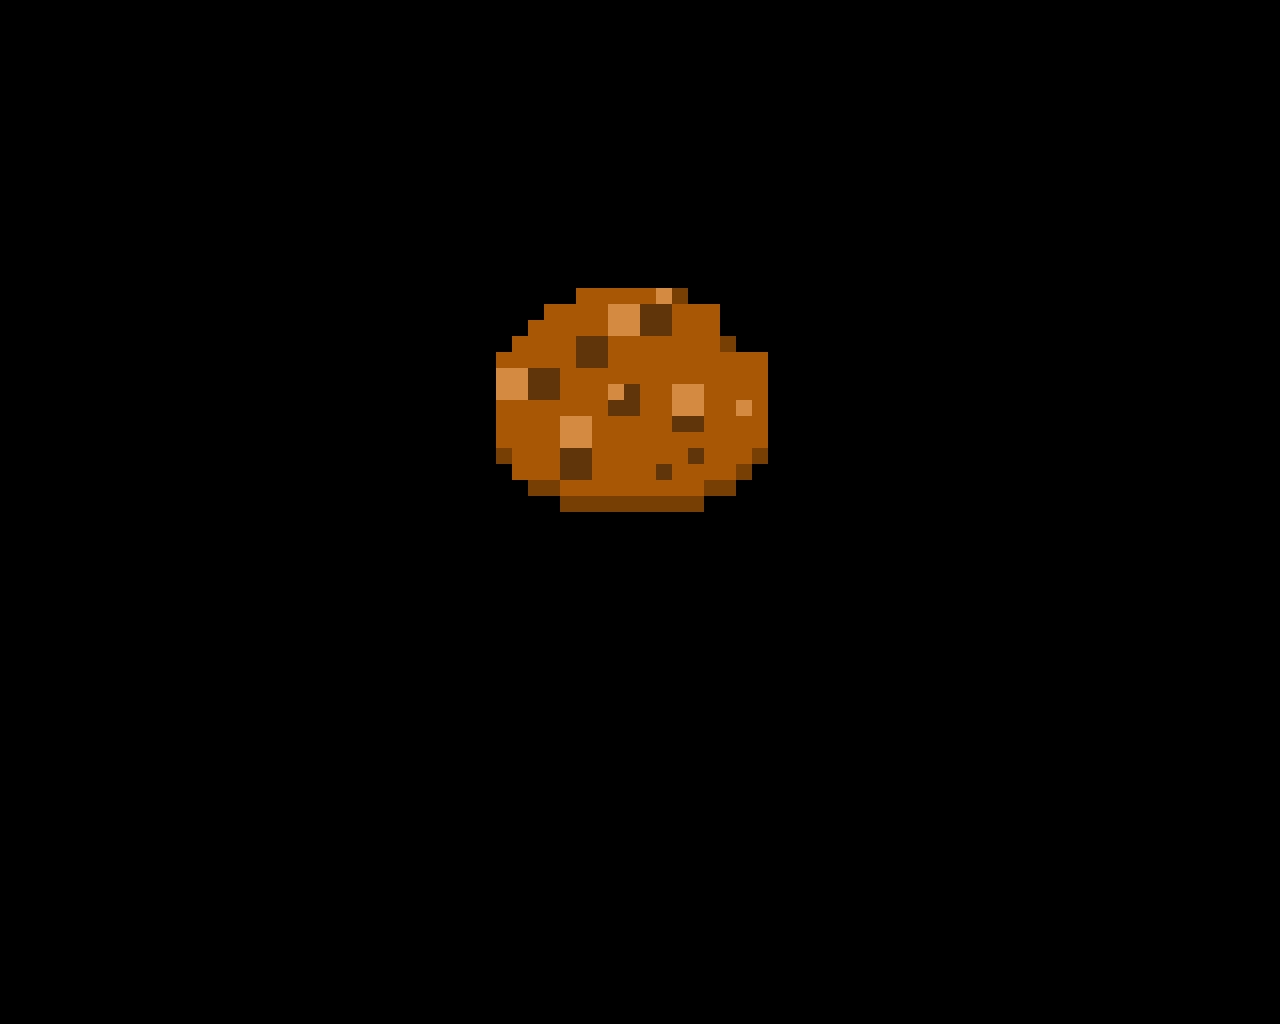 minecraft cookie (food)